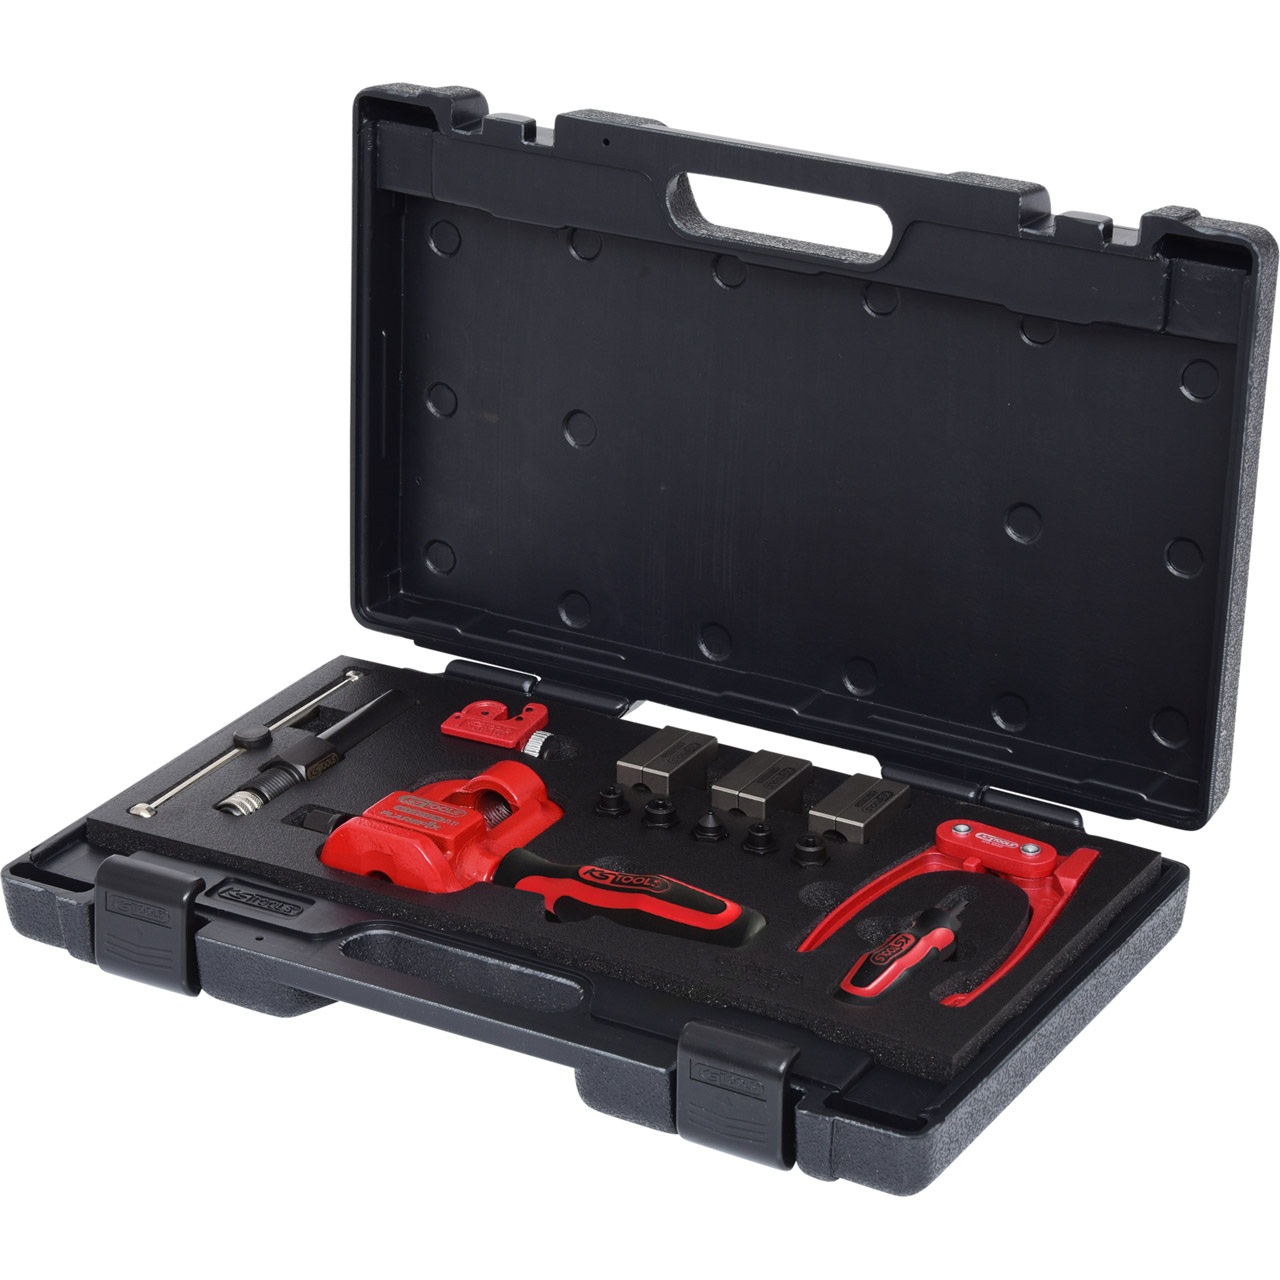 KS TOOLS 122.1290 Profibördelgerät Hydraulik / Bördelgerät für Bremsleitungen